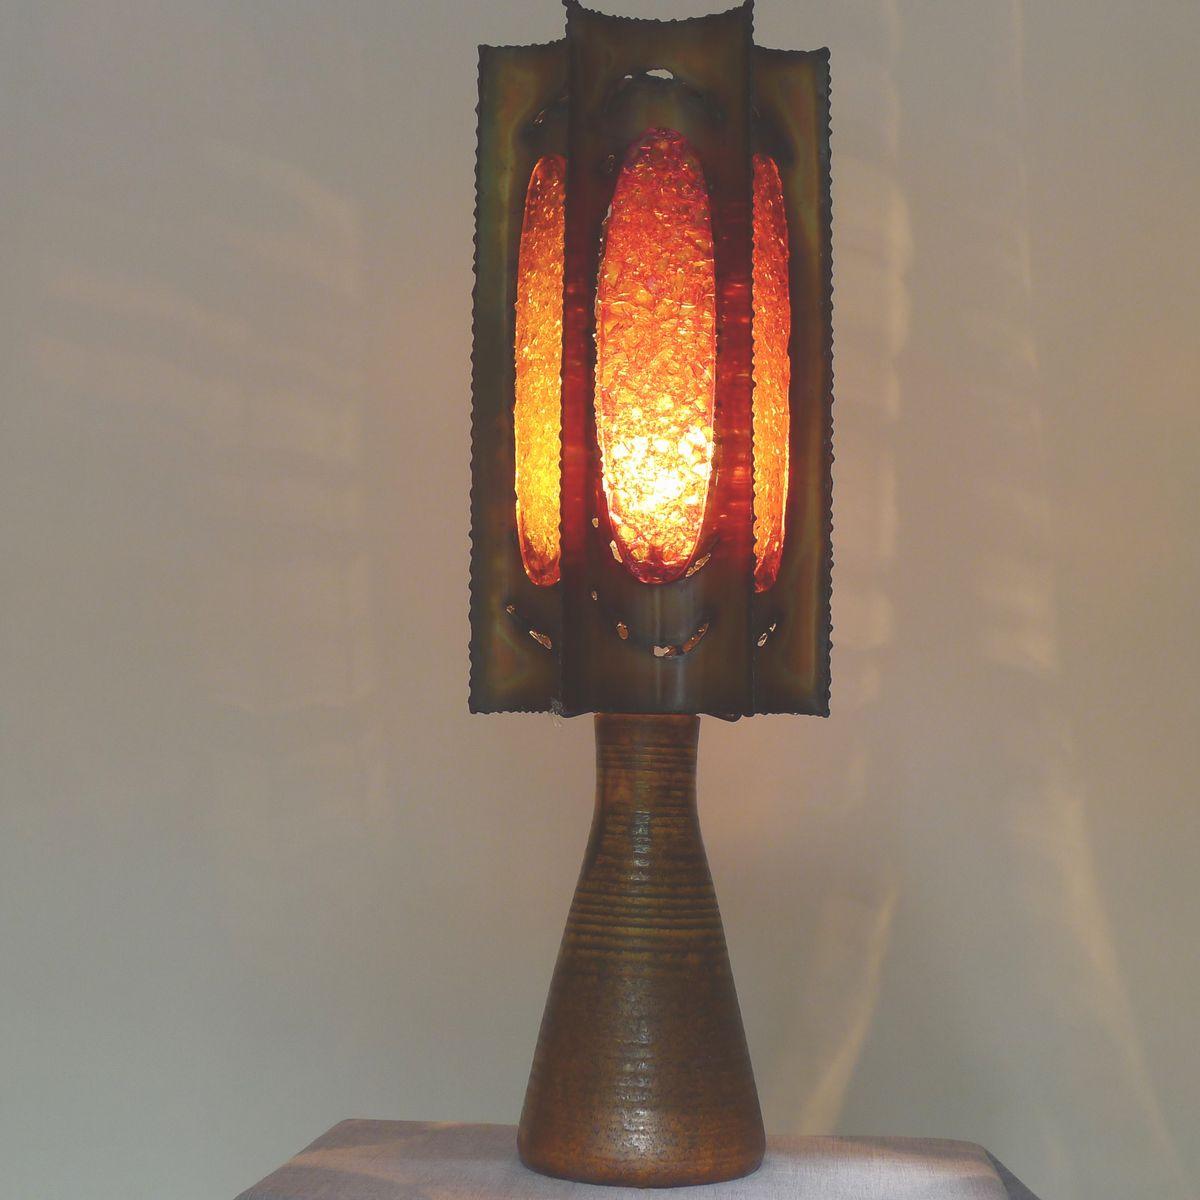 lampe de bureau vintage d 39 accolay en vente sur pamono. Black Bedroom Furniture Sets. Home Design Ideas